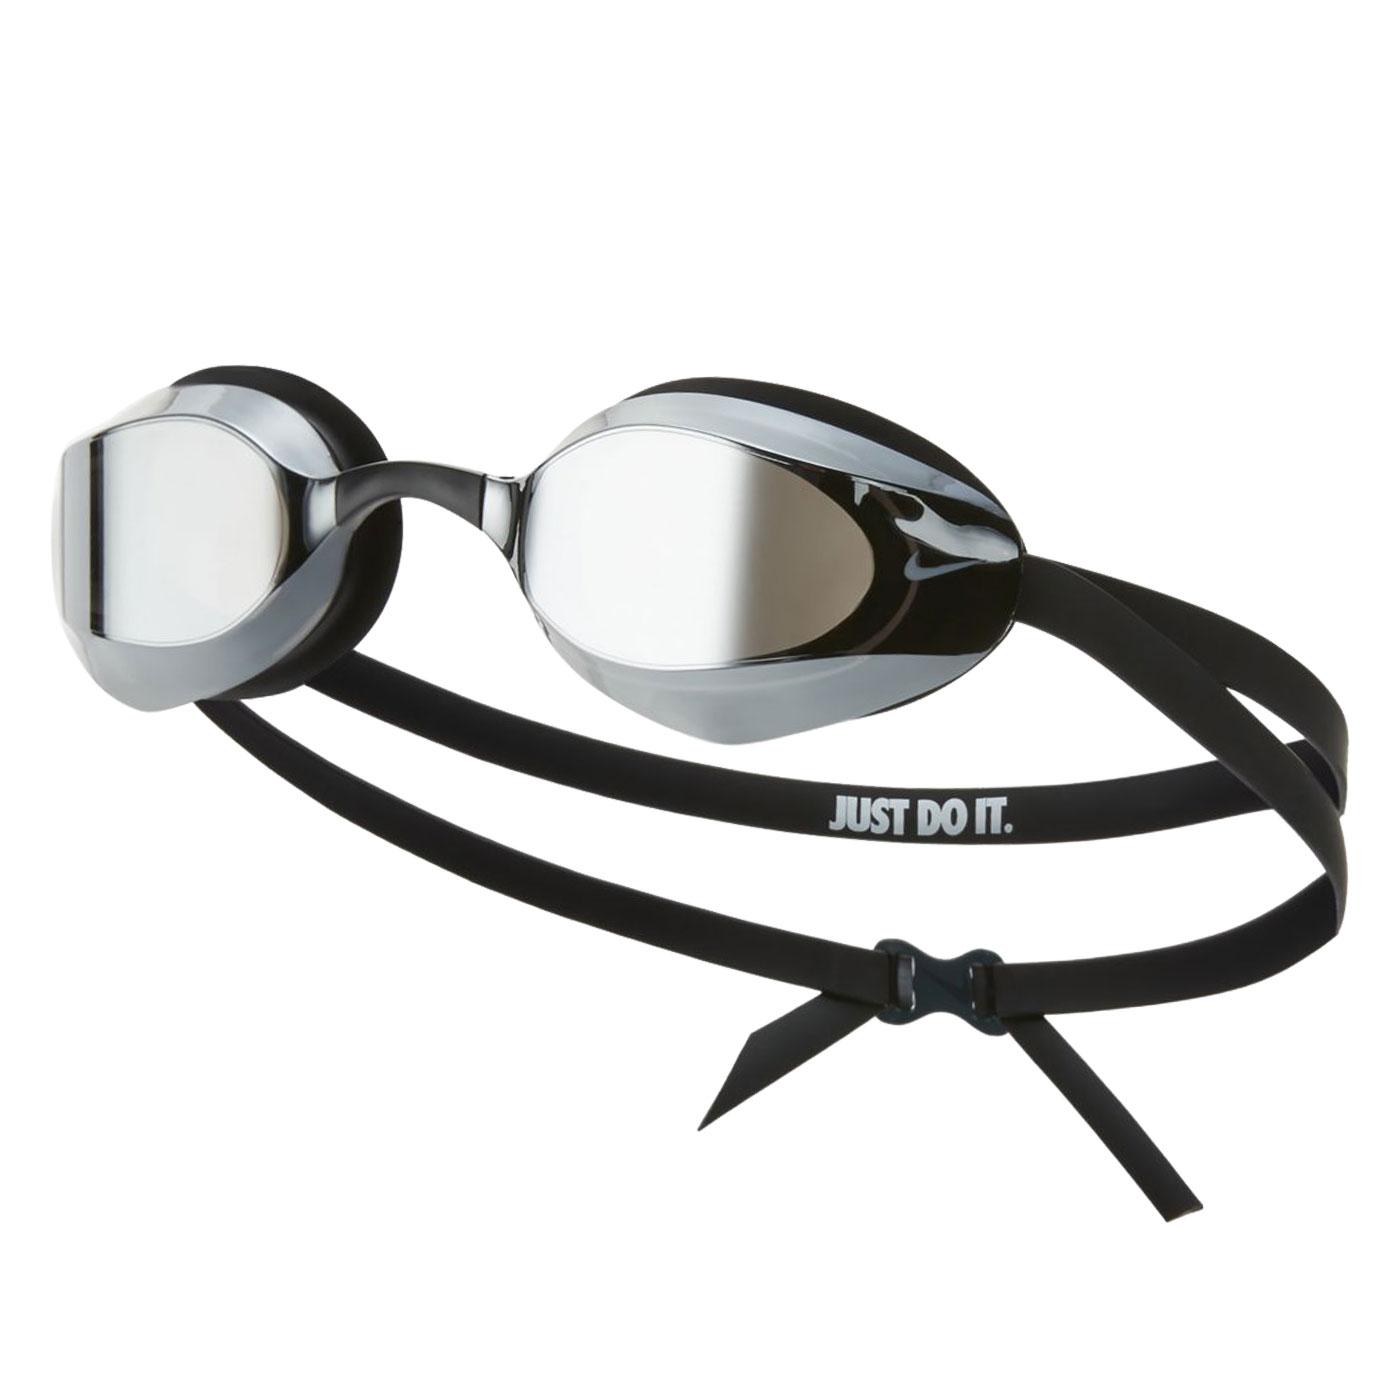 NIKE SWIM 成人專業型鏡面泳鏡 NESSA176-040